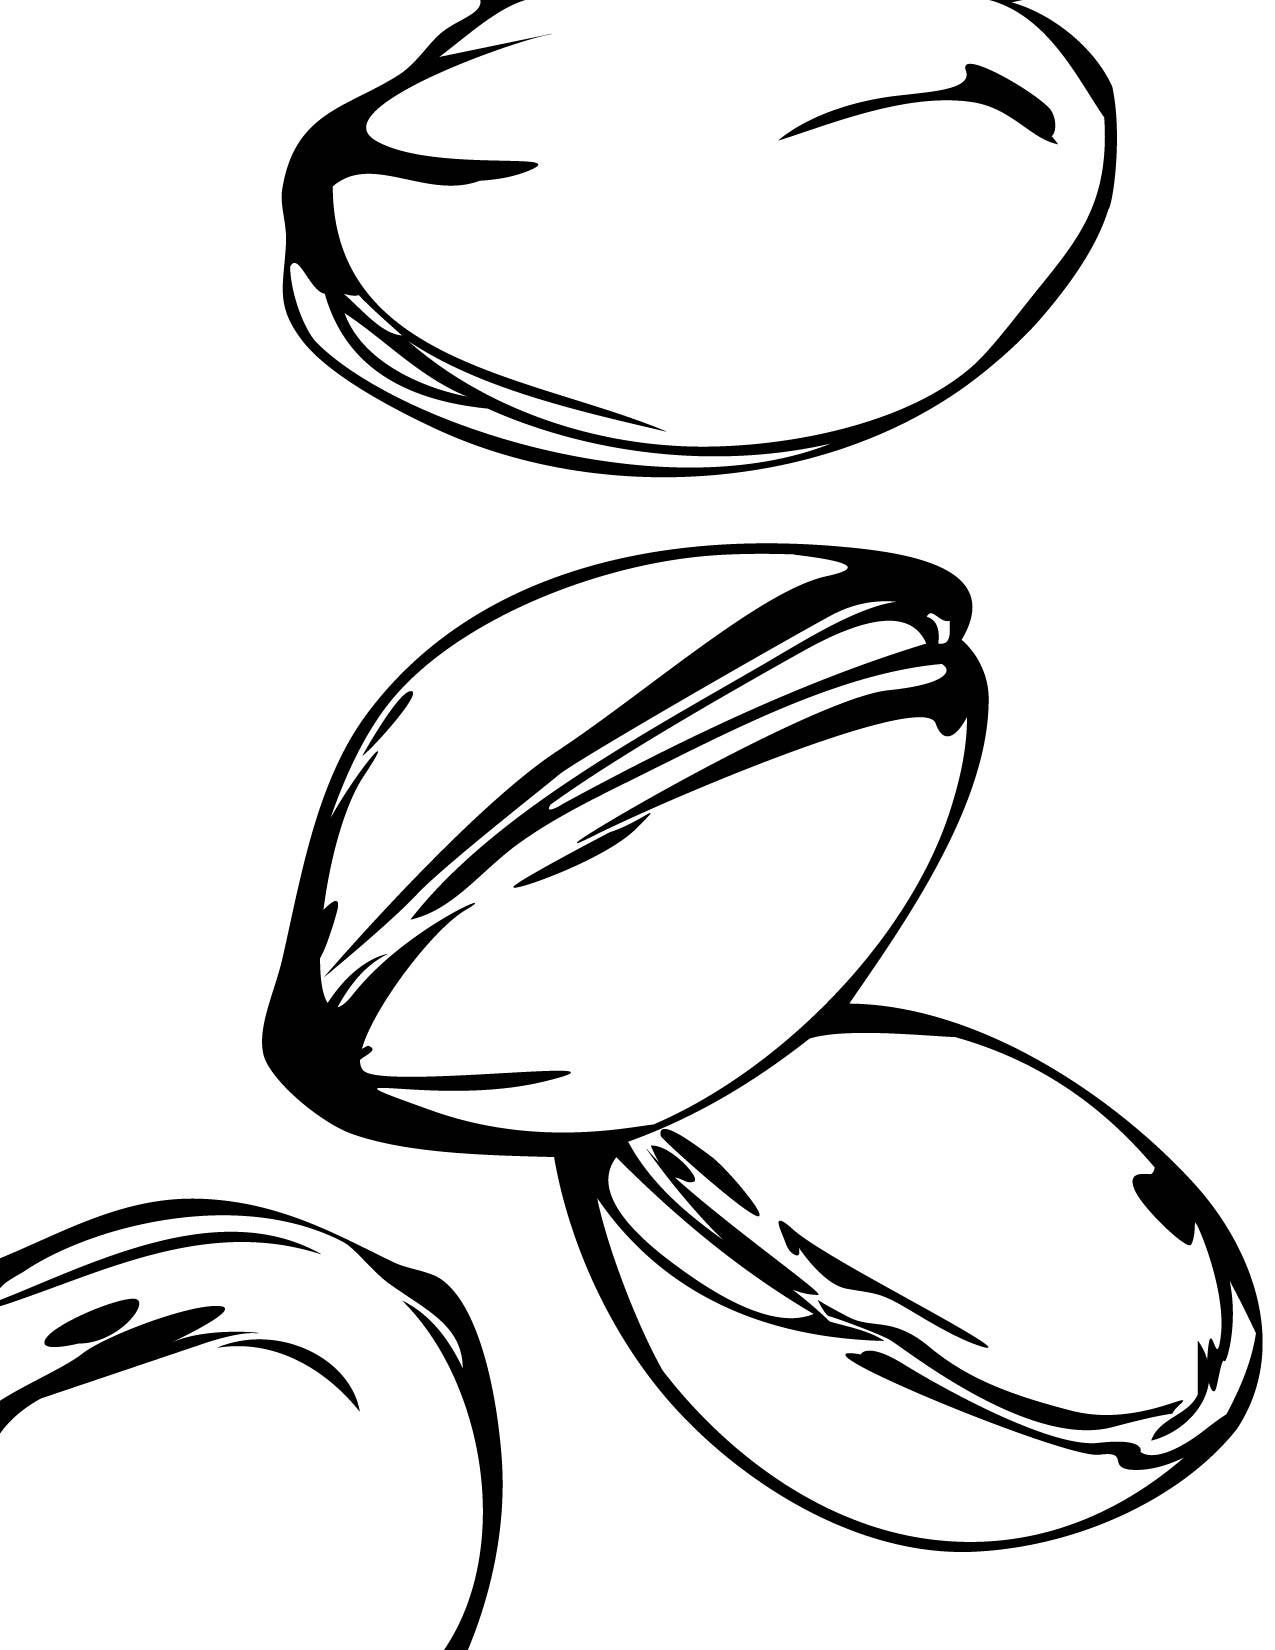 pistachio coloring page handipoints